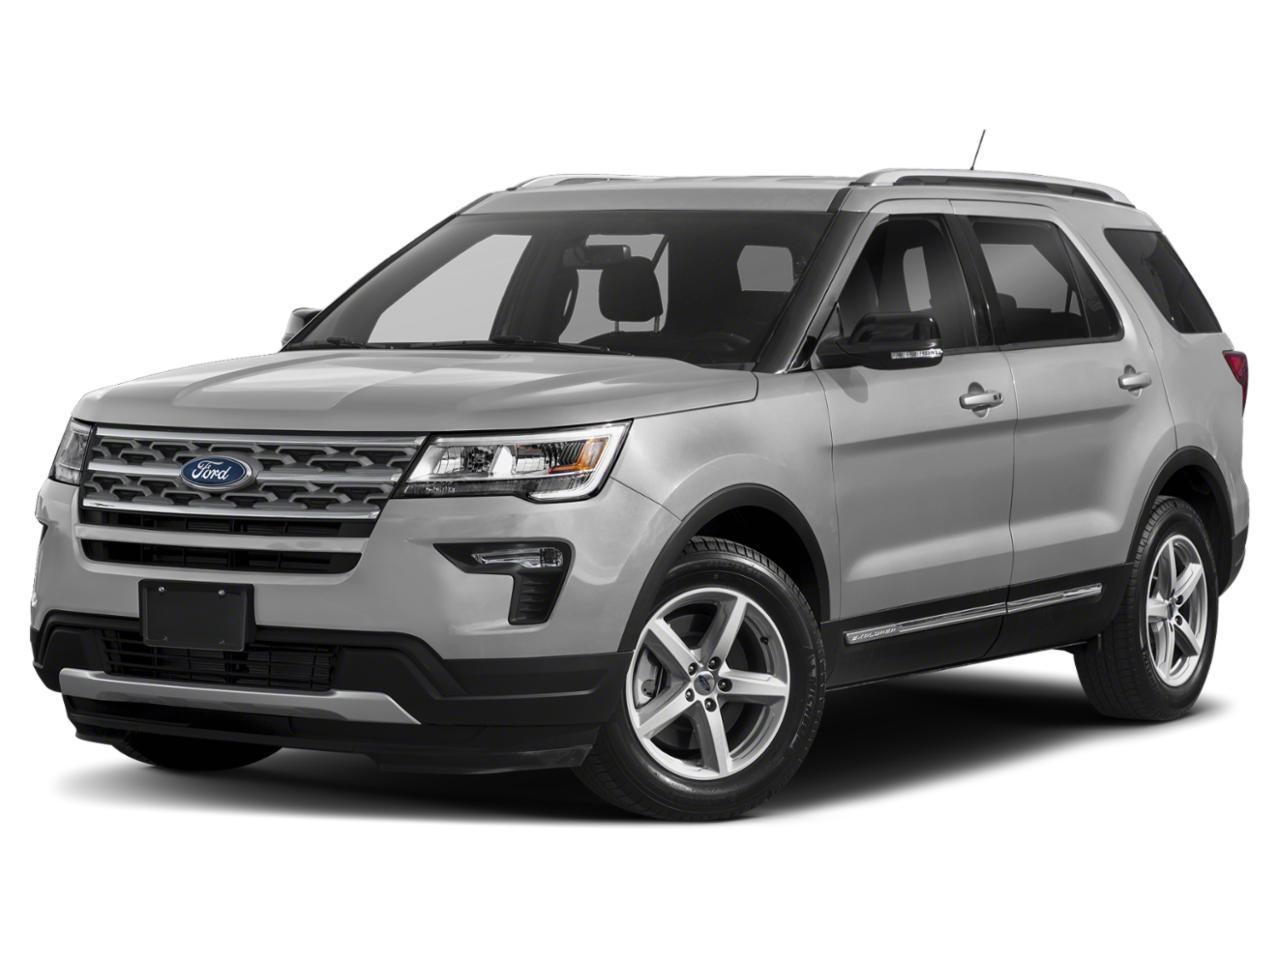 Ingot Silver Metallic 2018 Ford Explorer LIMITED SUV Winston-Salem NC